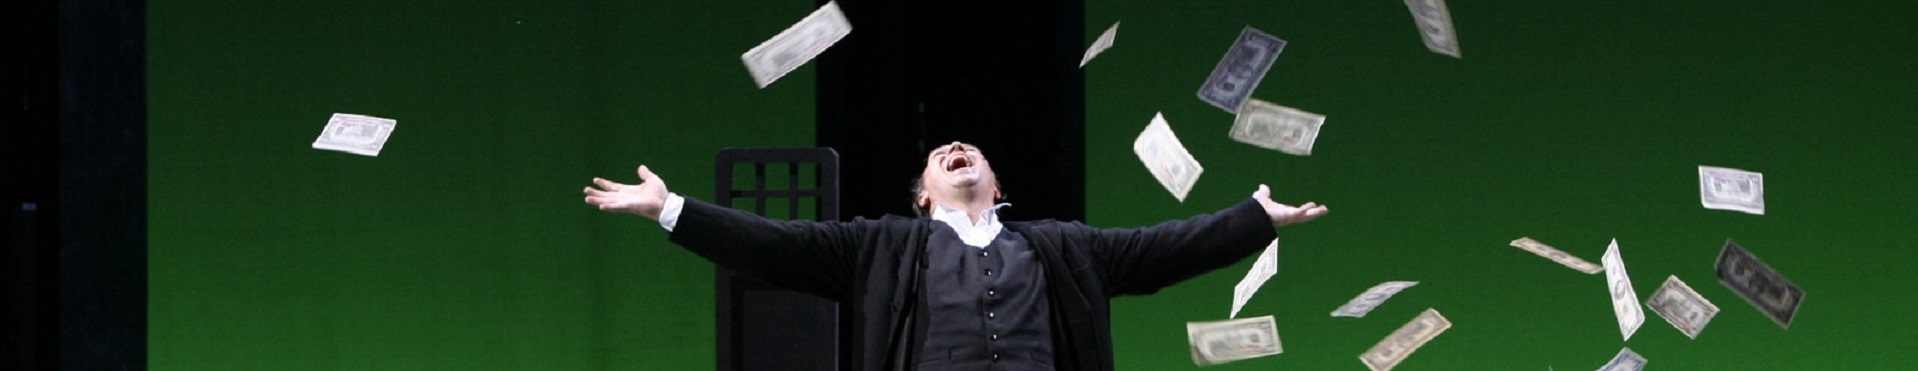 Watch Premium Classical Music, On-Demand & TV | Stingray